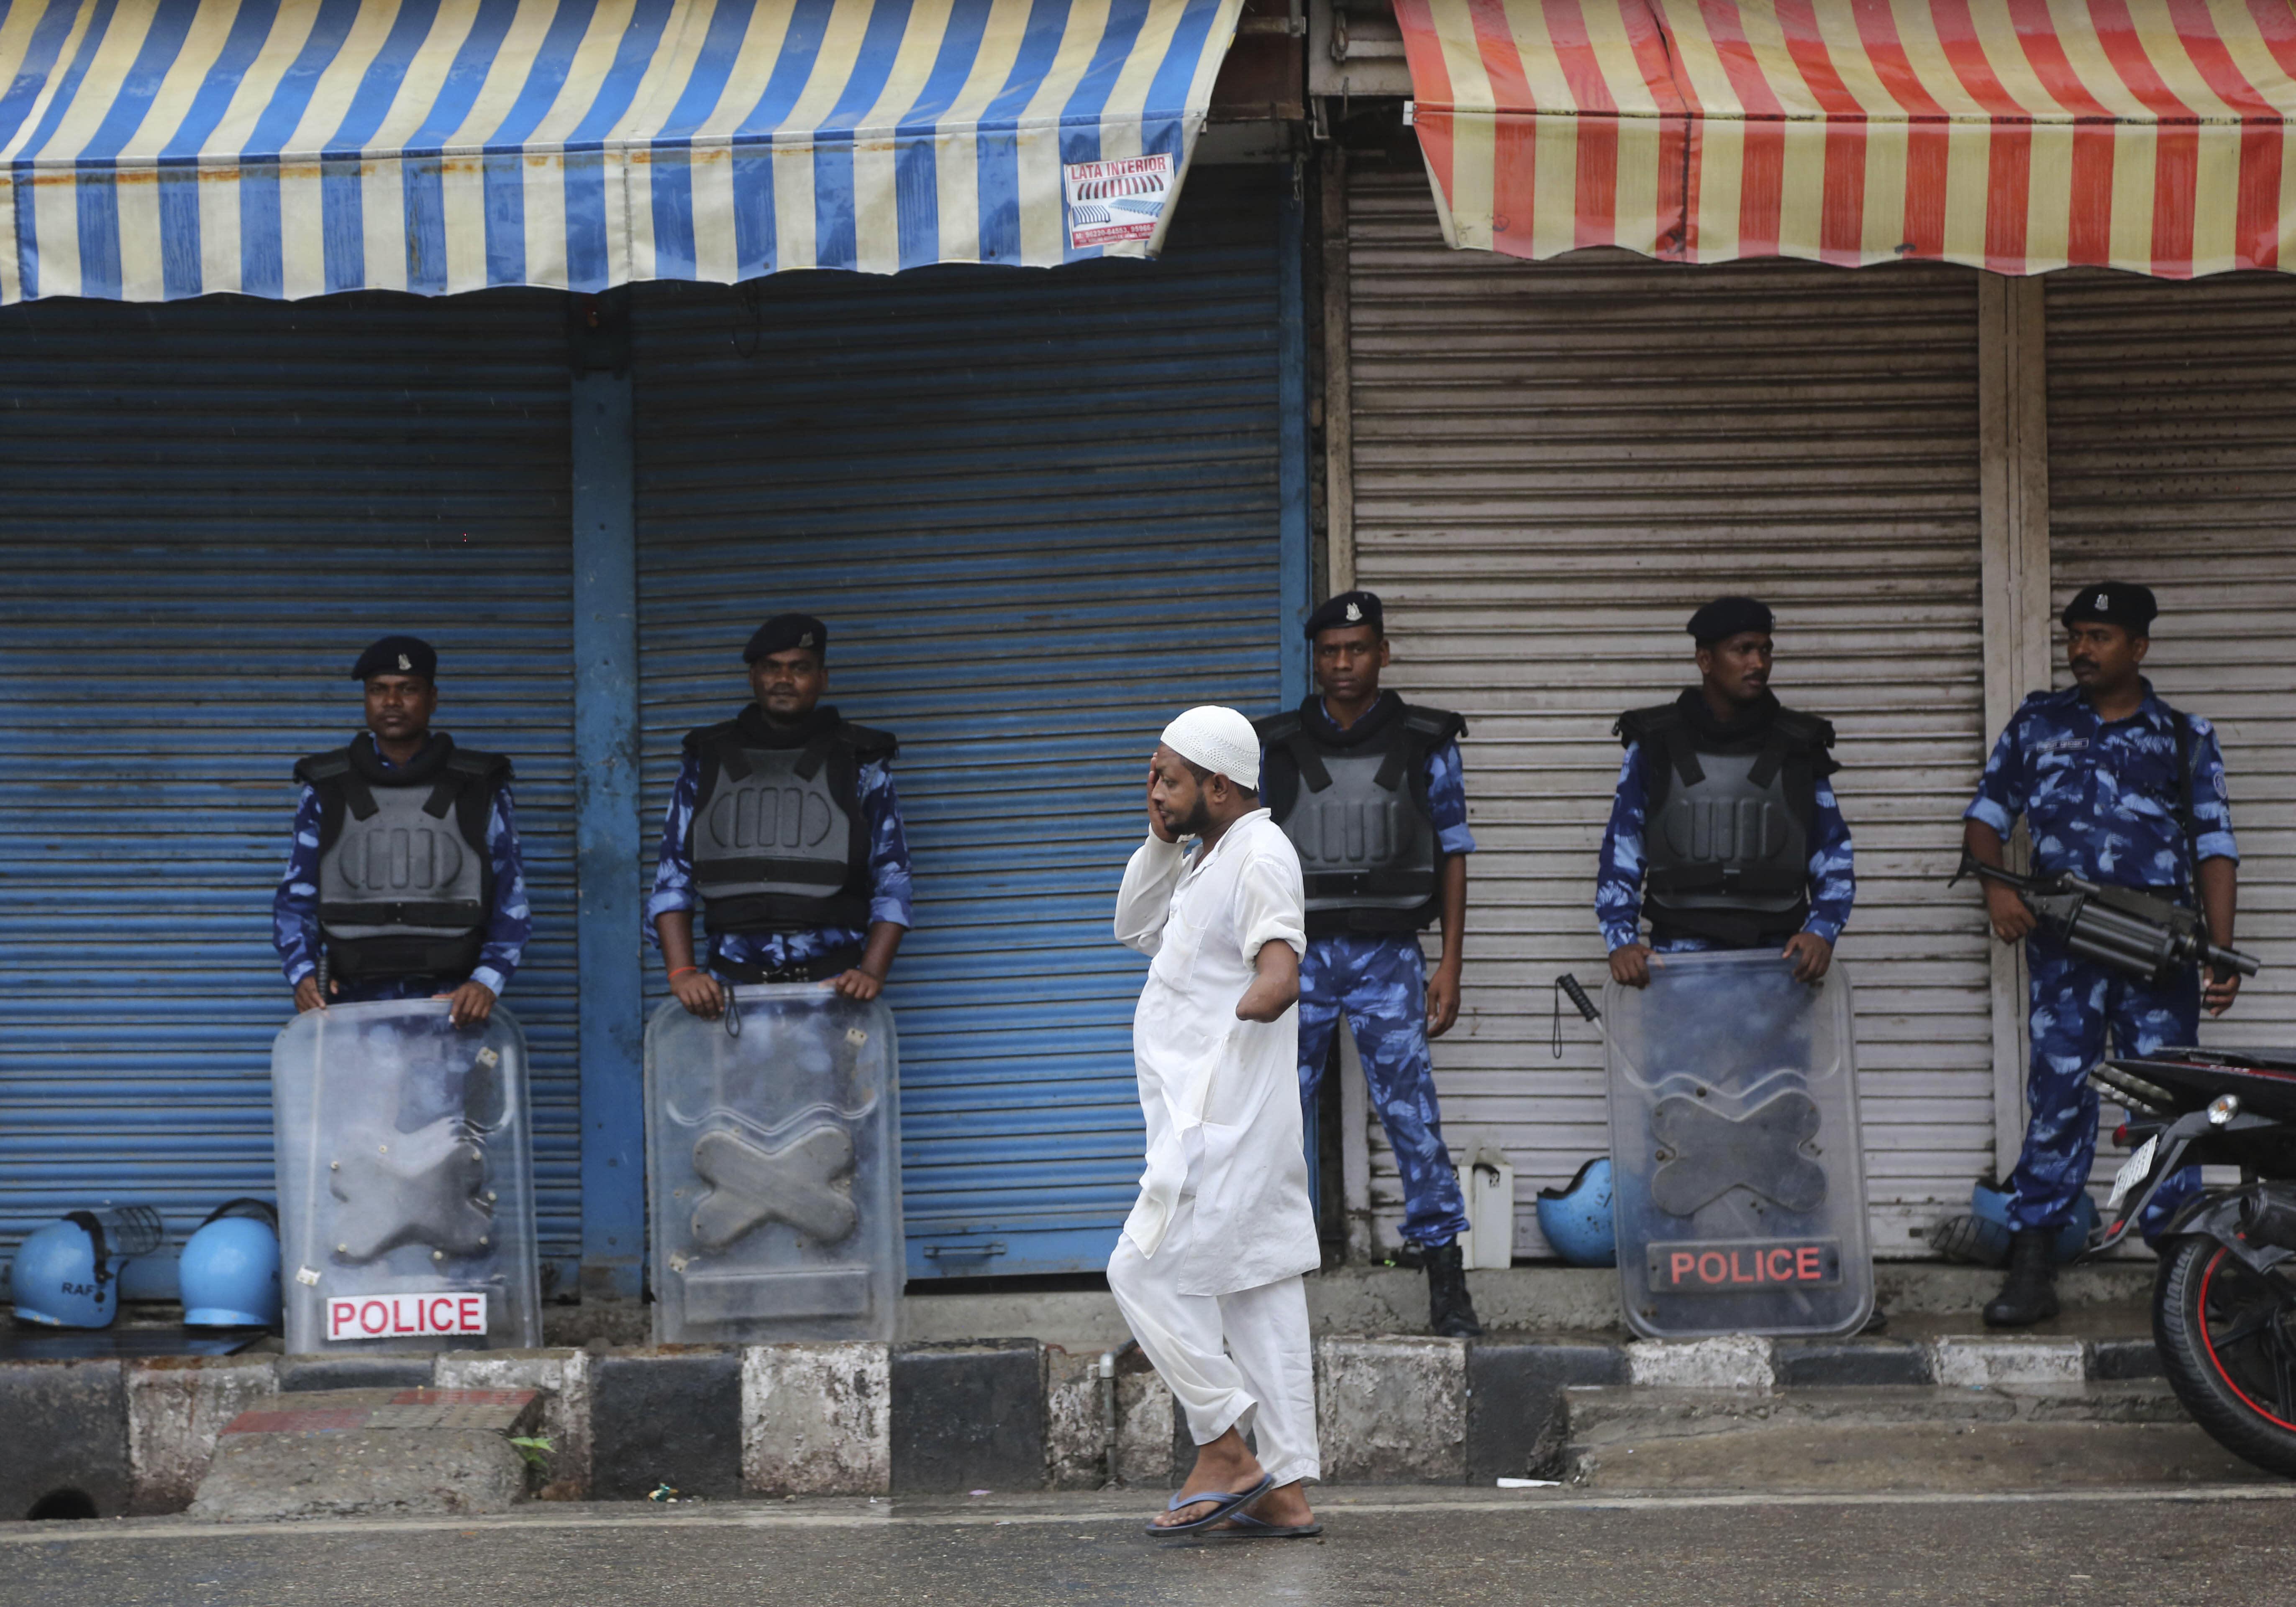 Kashmir curfew partially eased for prayers amid lockdown